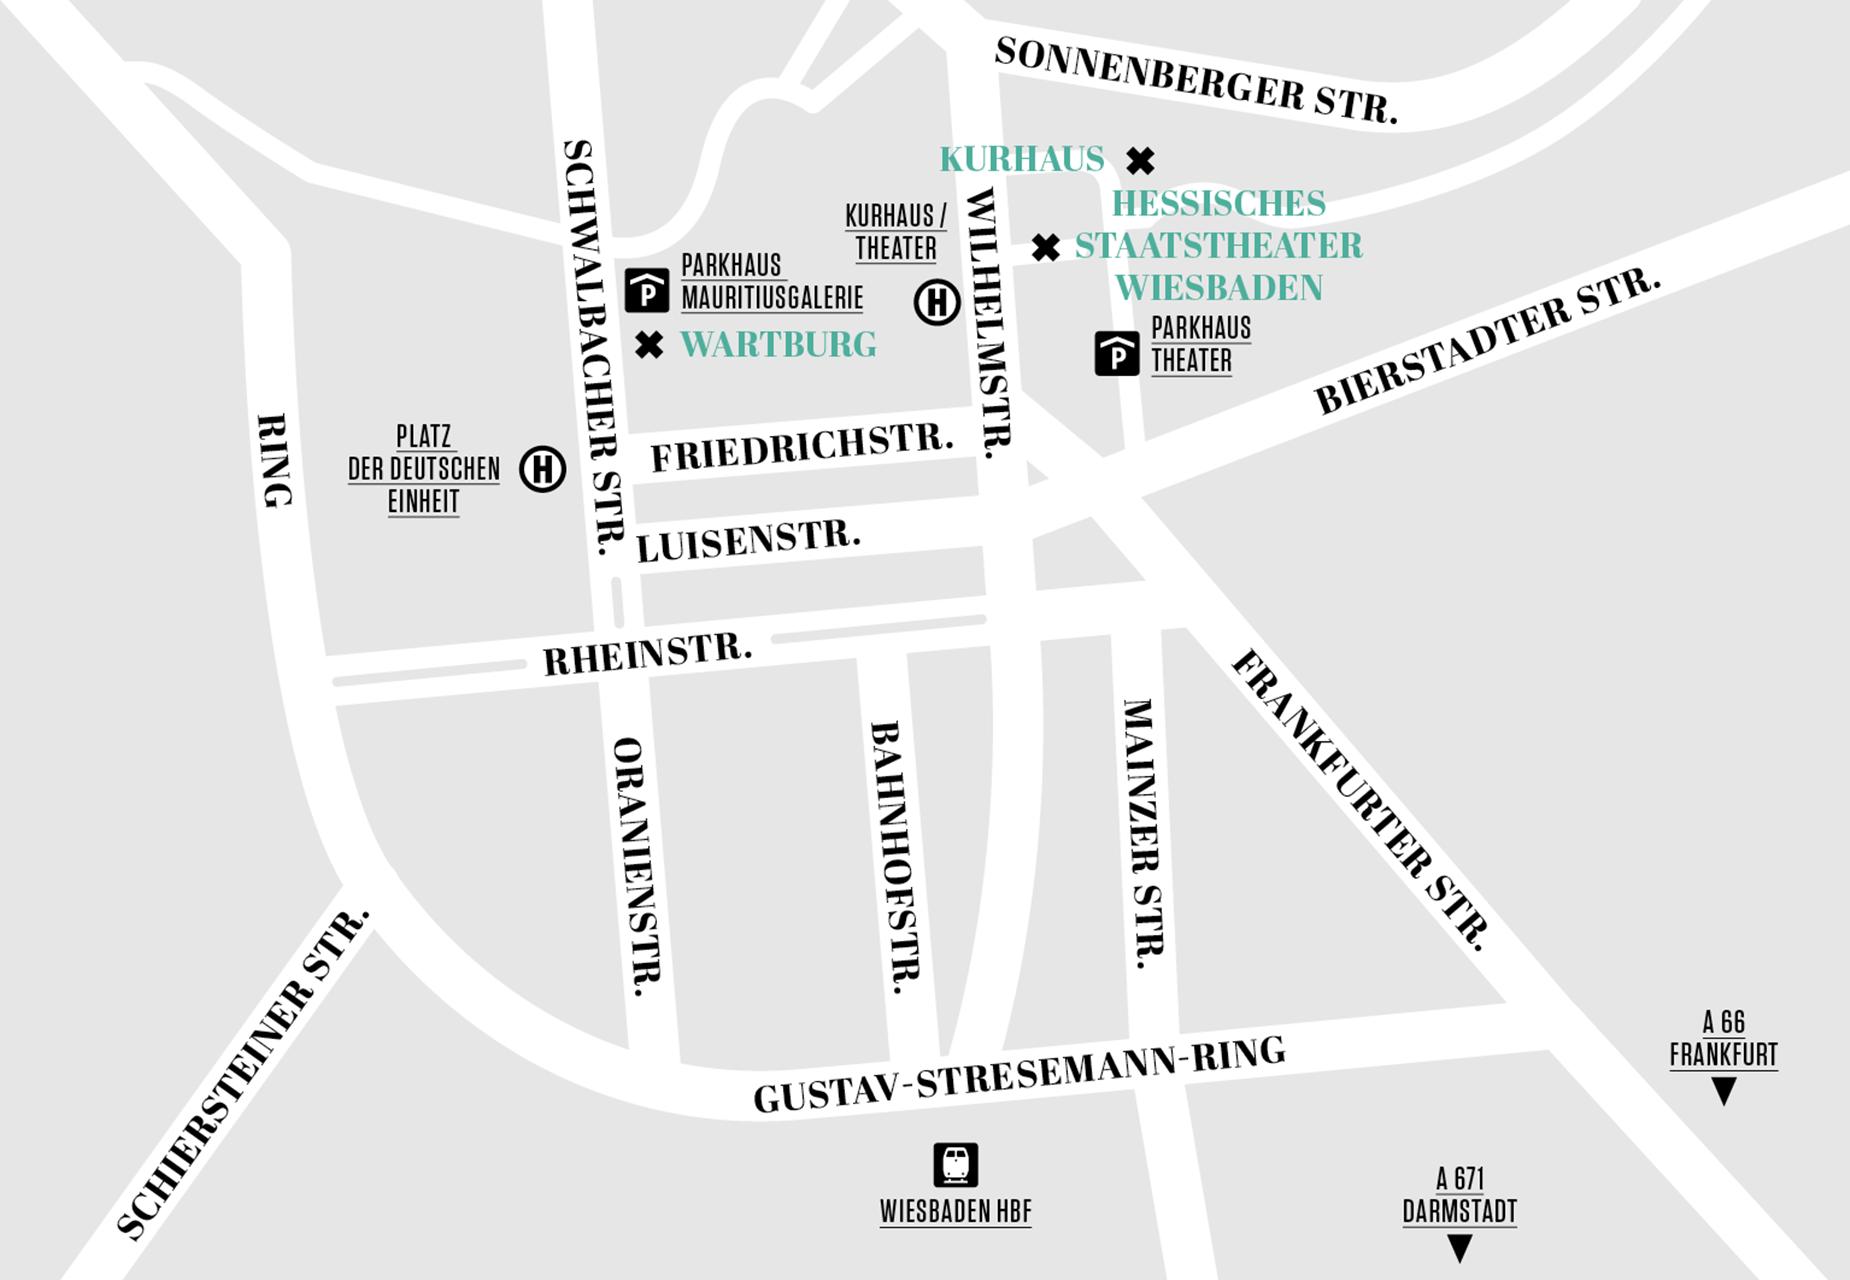 Hessisches Staatstheater Wiesbaden Anfahrt